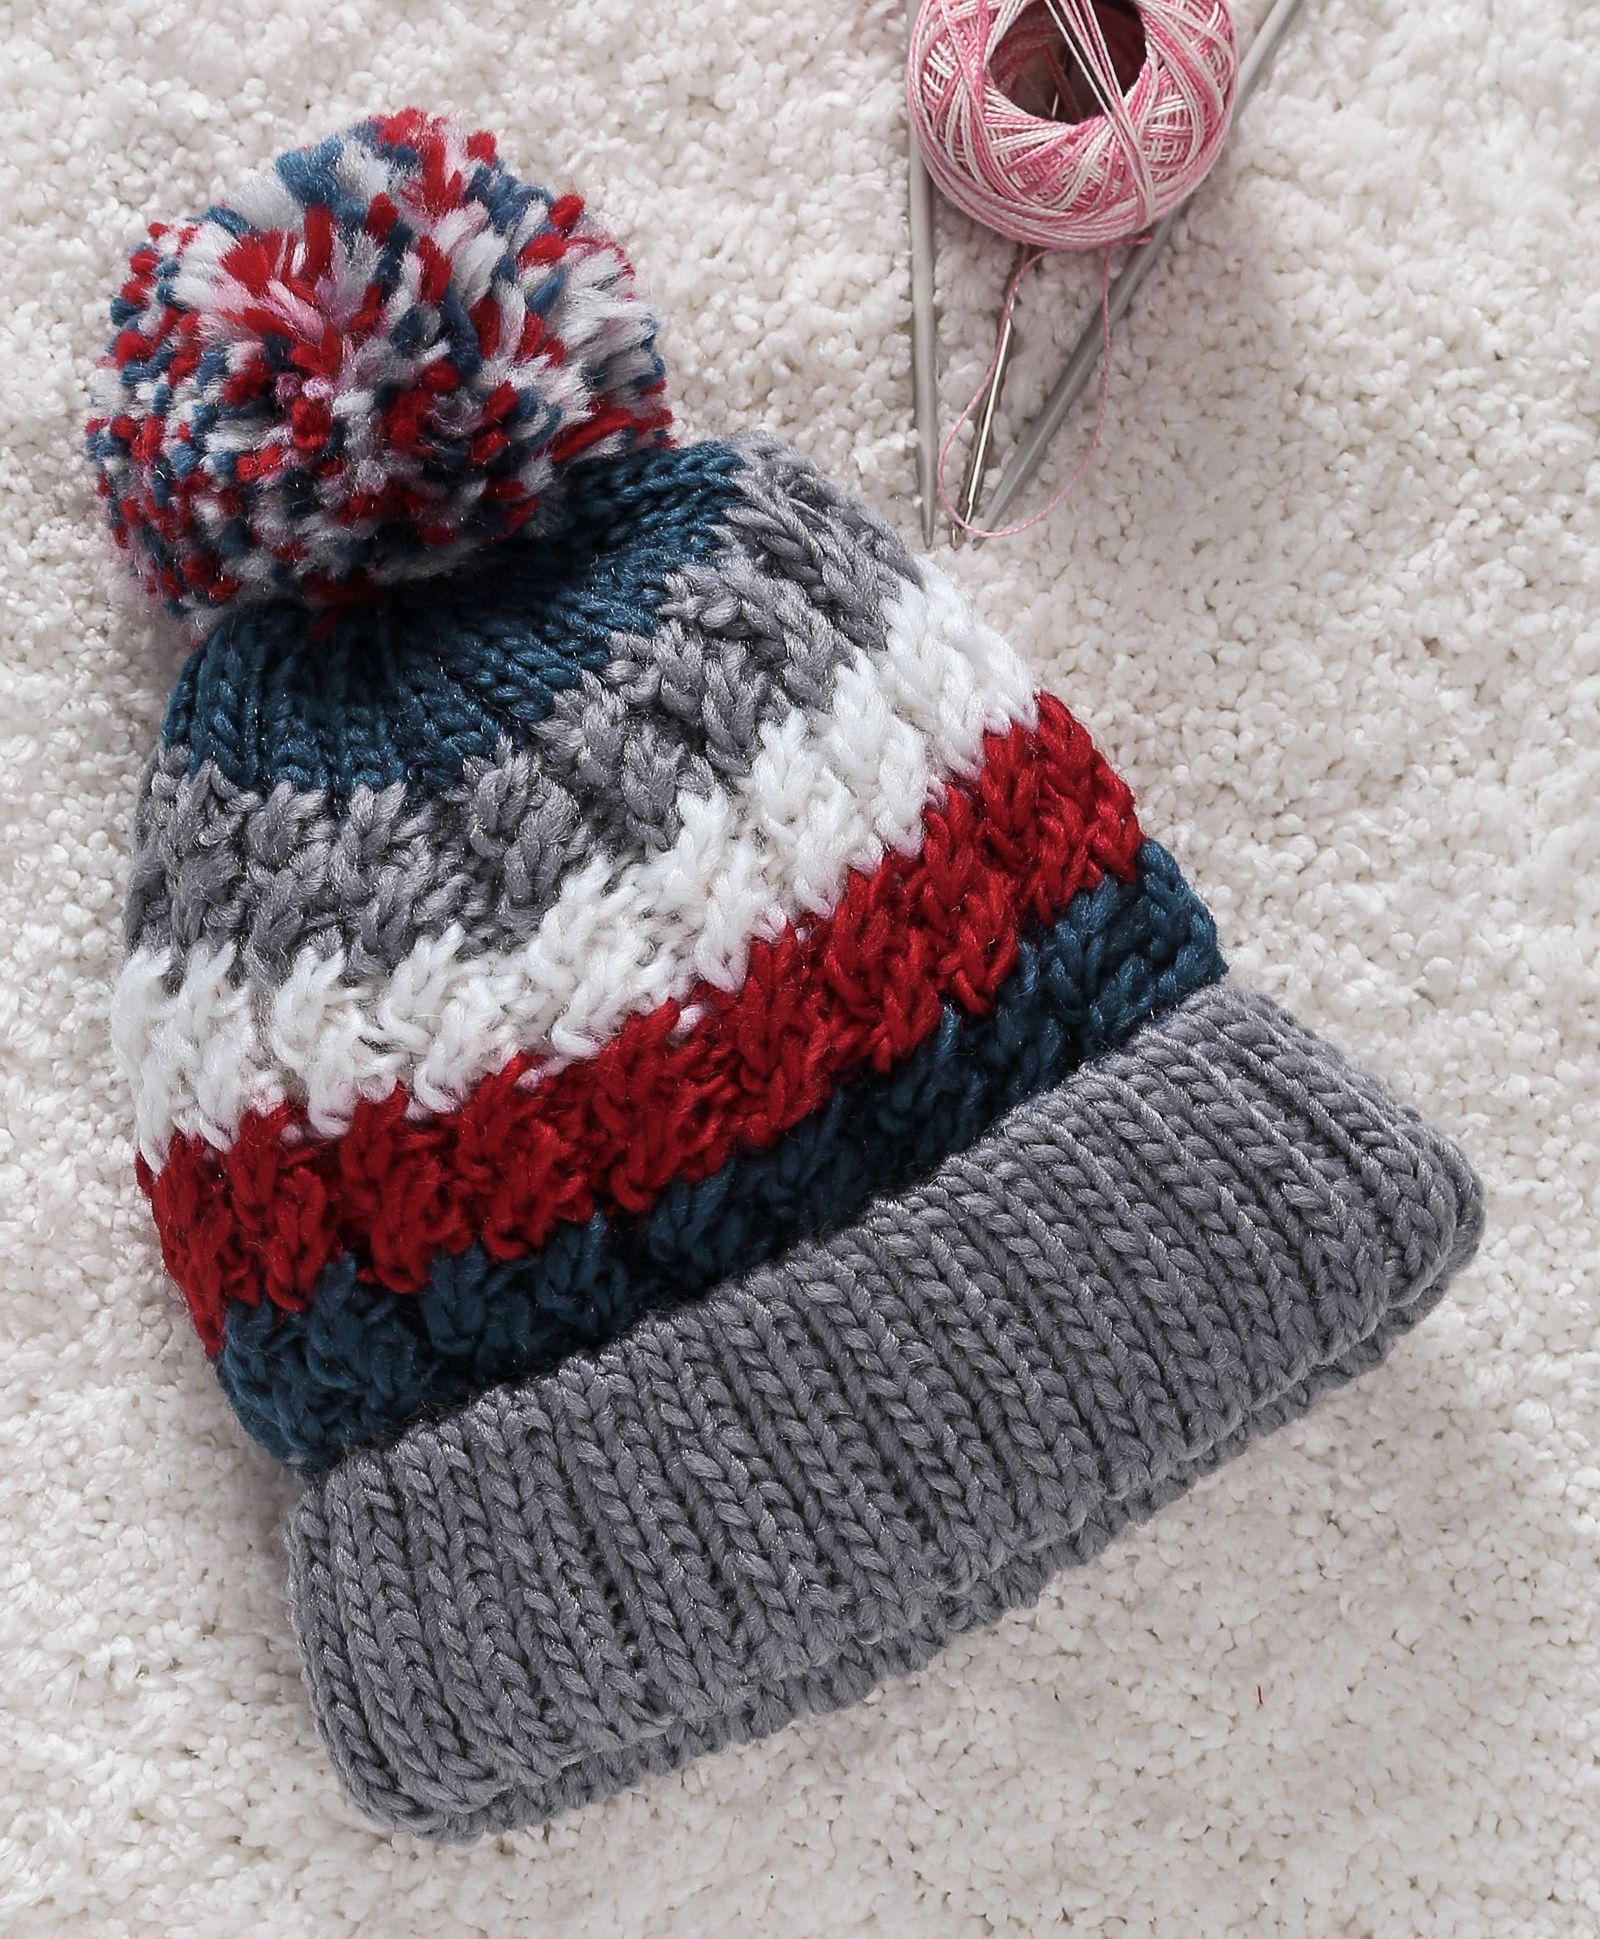 cfc031a68a2 Babyhug Winter Wear Cap With Pom Pom Motif Grey Online in India ...